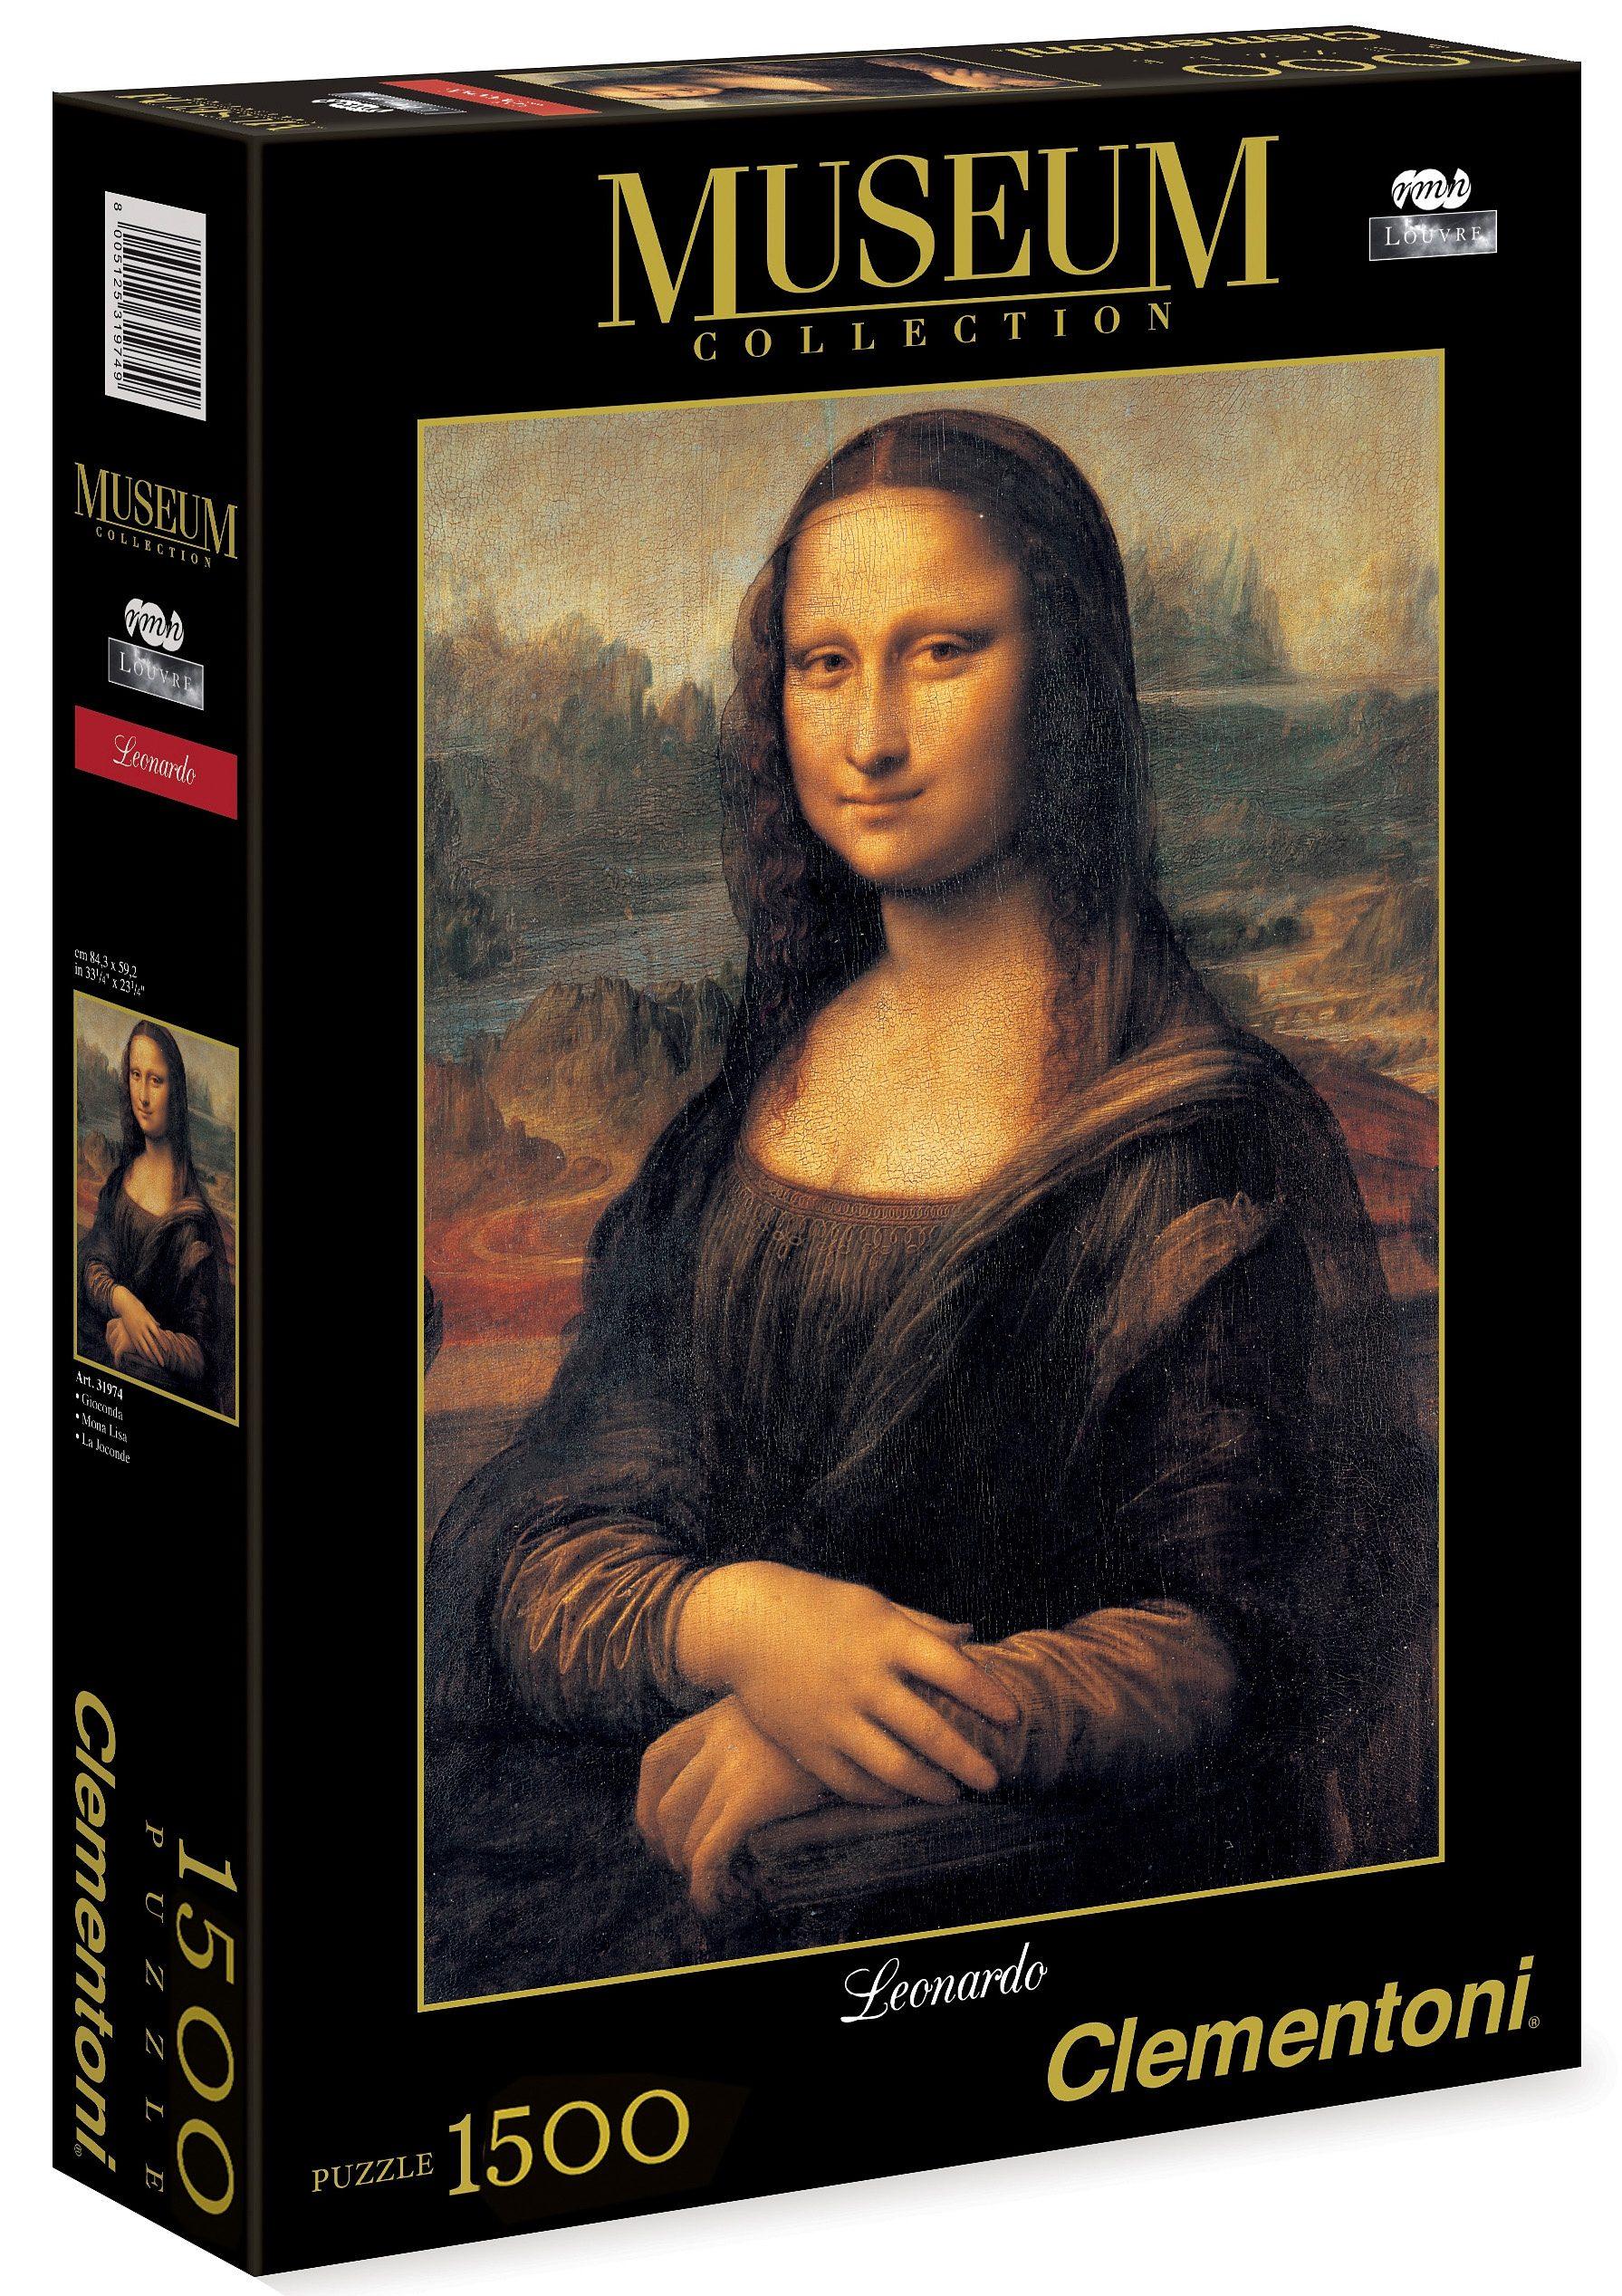 Clementoni Puzzle, 1500 Teile, »Leonardo - Mona Lisa«